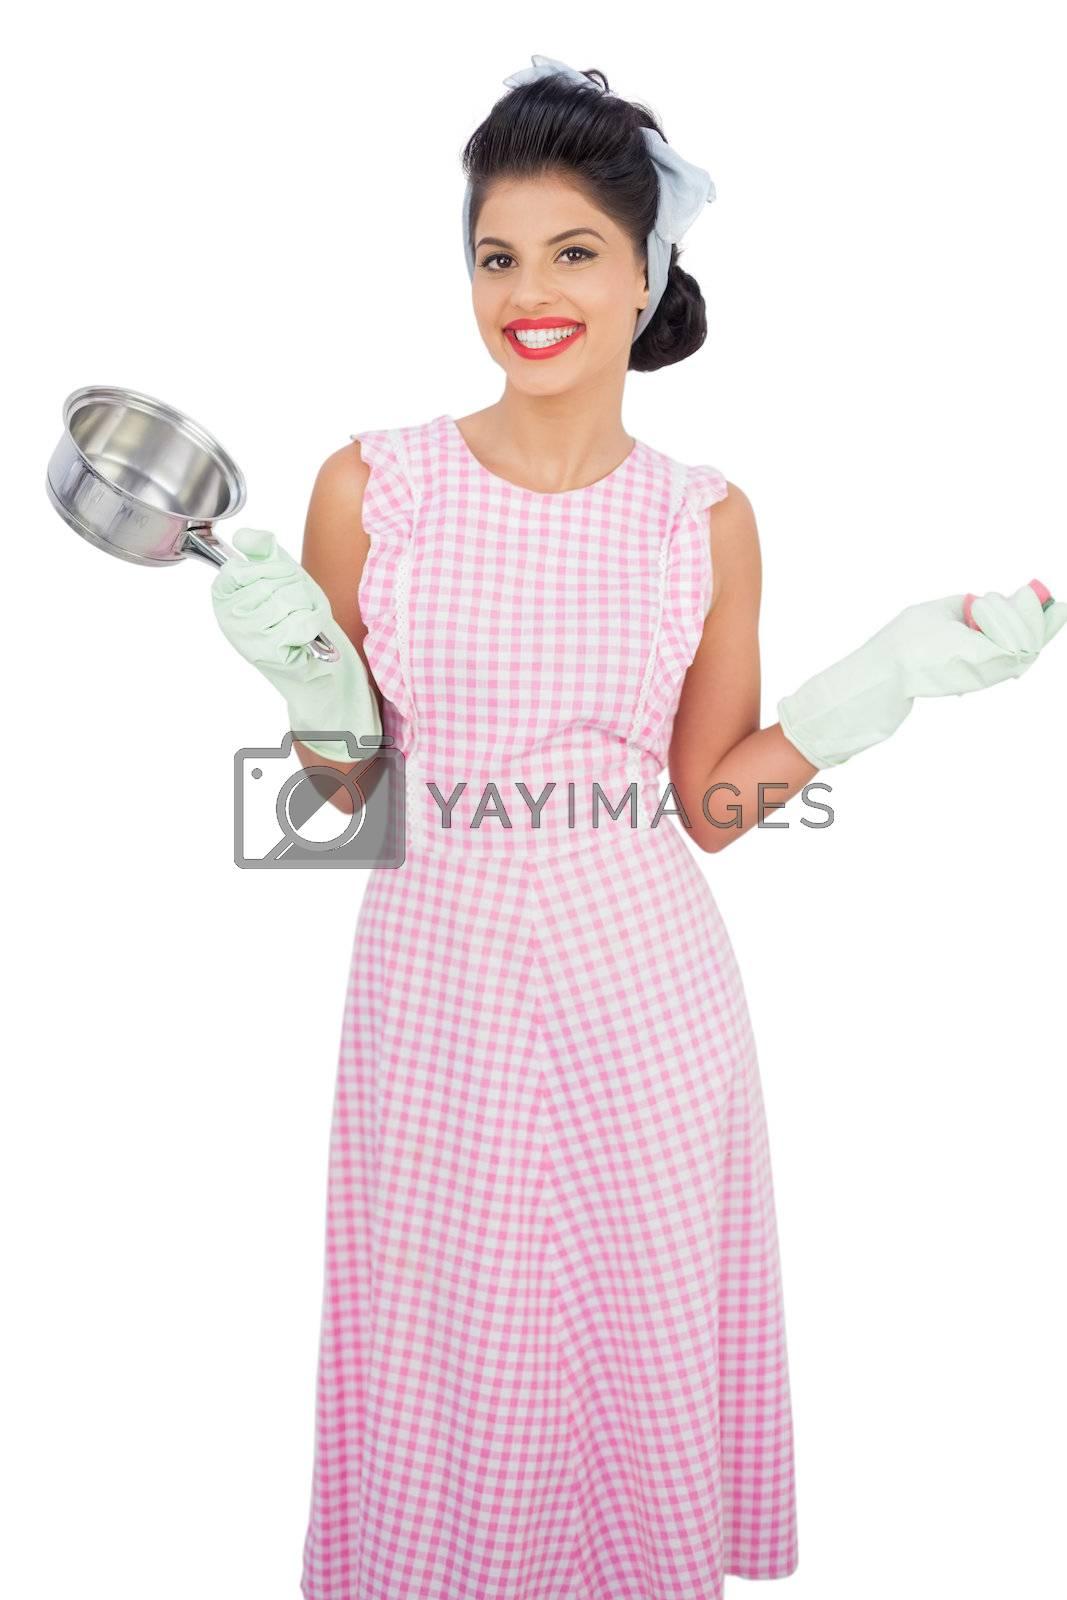 Joyful black hair model holding a pan and wearing rubber gloves by Wavebreakmedia